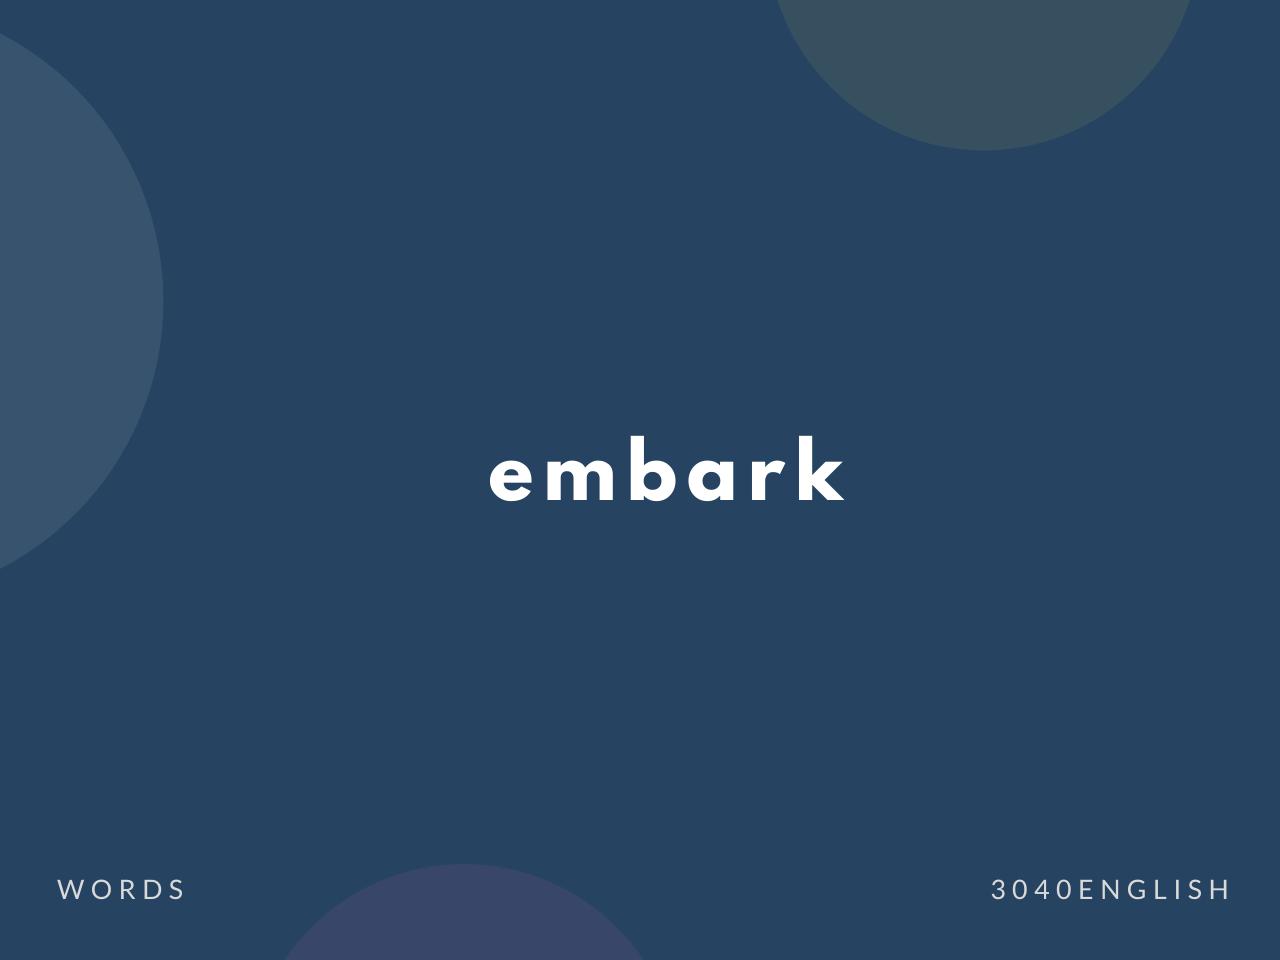 embark の意味と簡単な使い方【音読用例文あり】